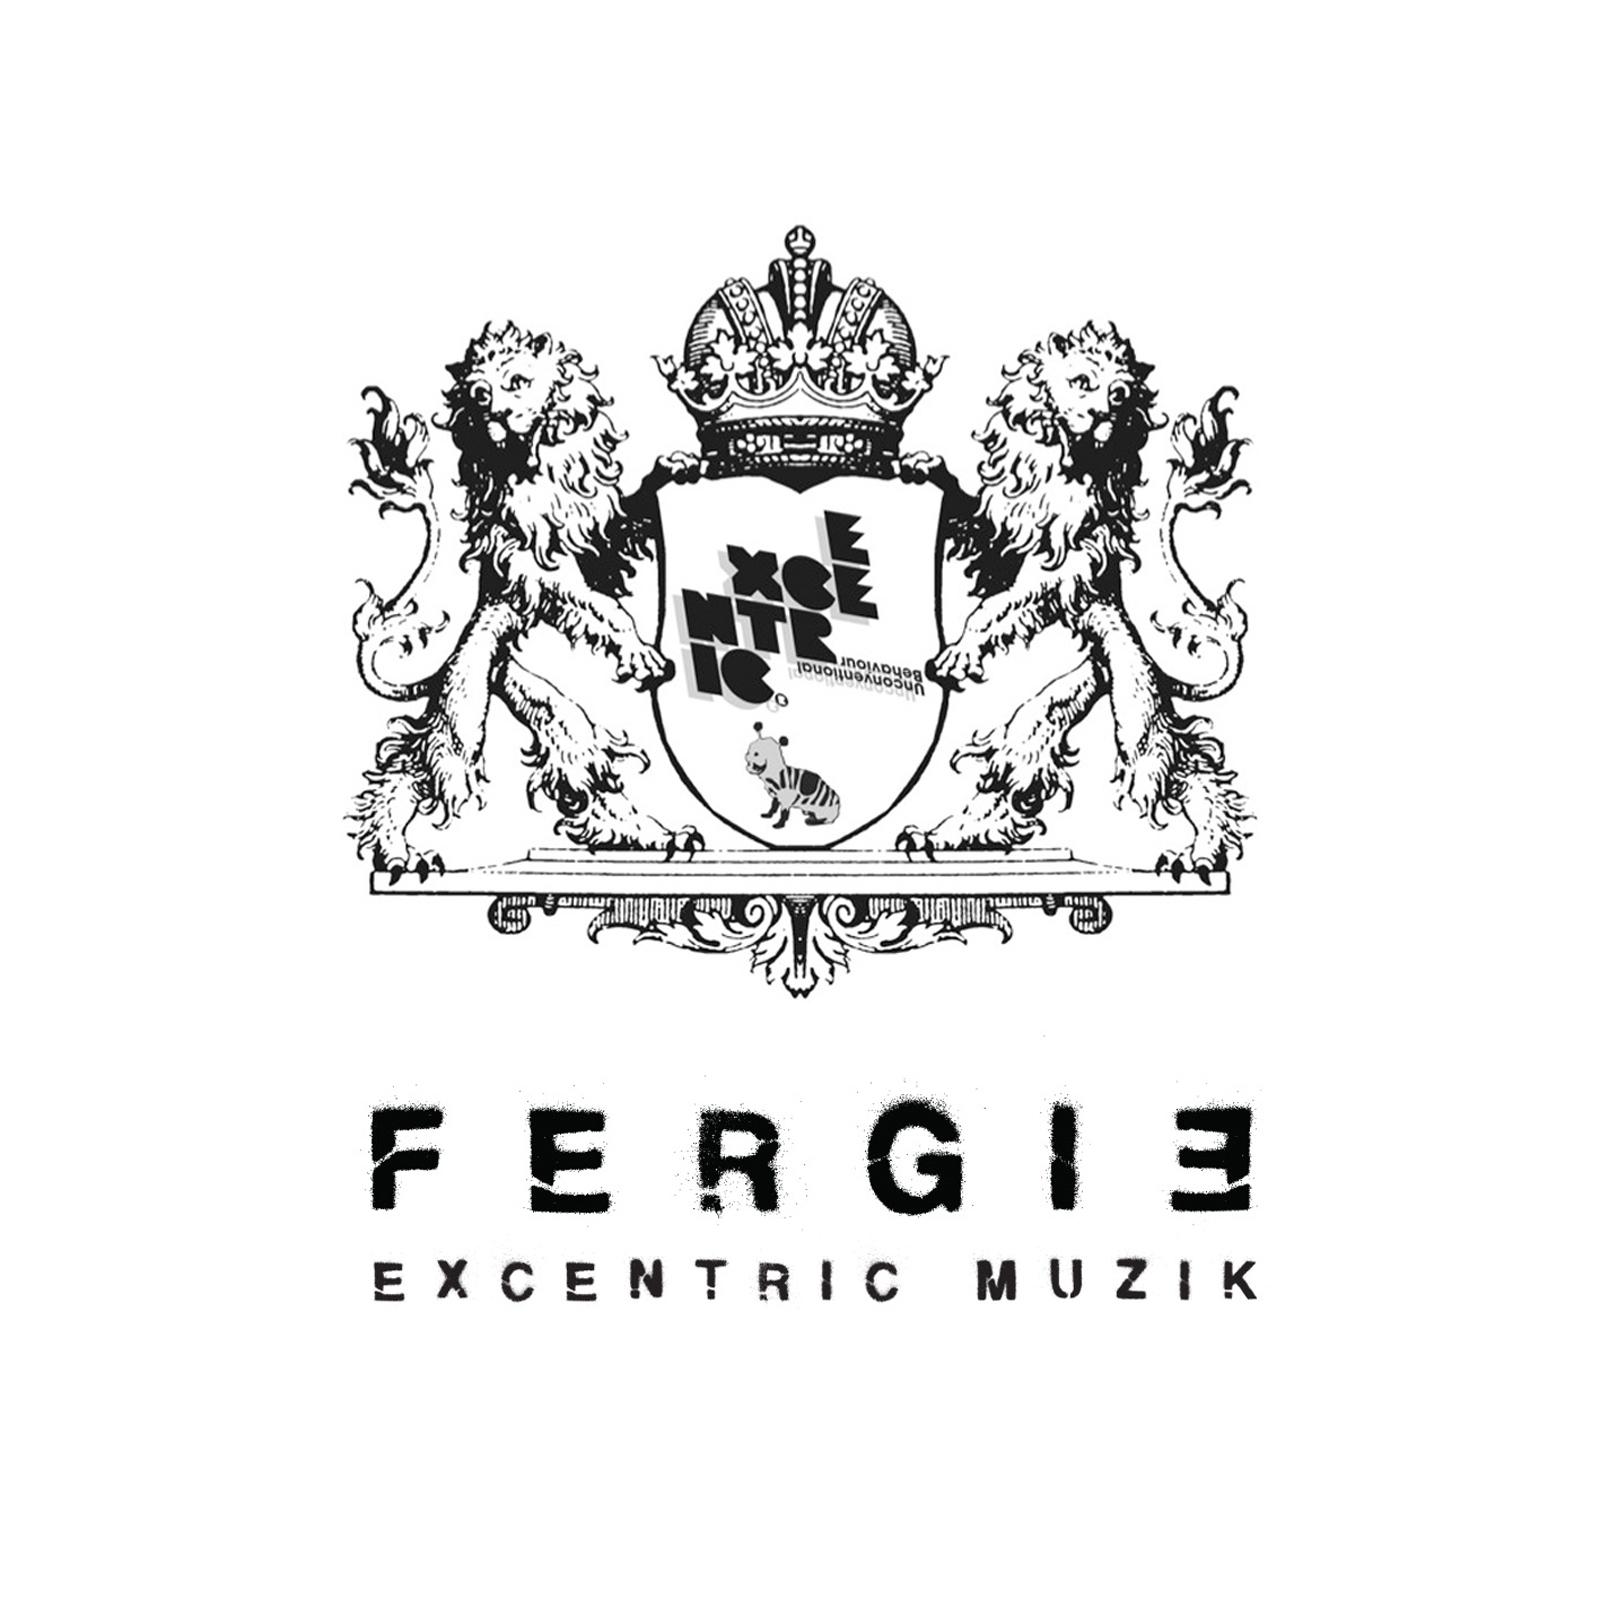 <![CDATA[Fergie's Excentric Muzik Selection]]>